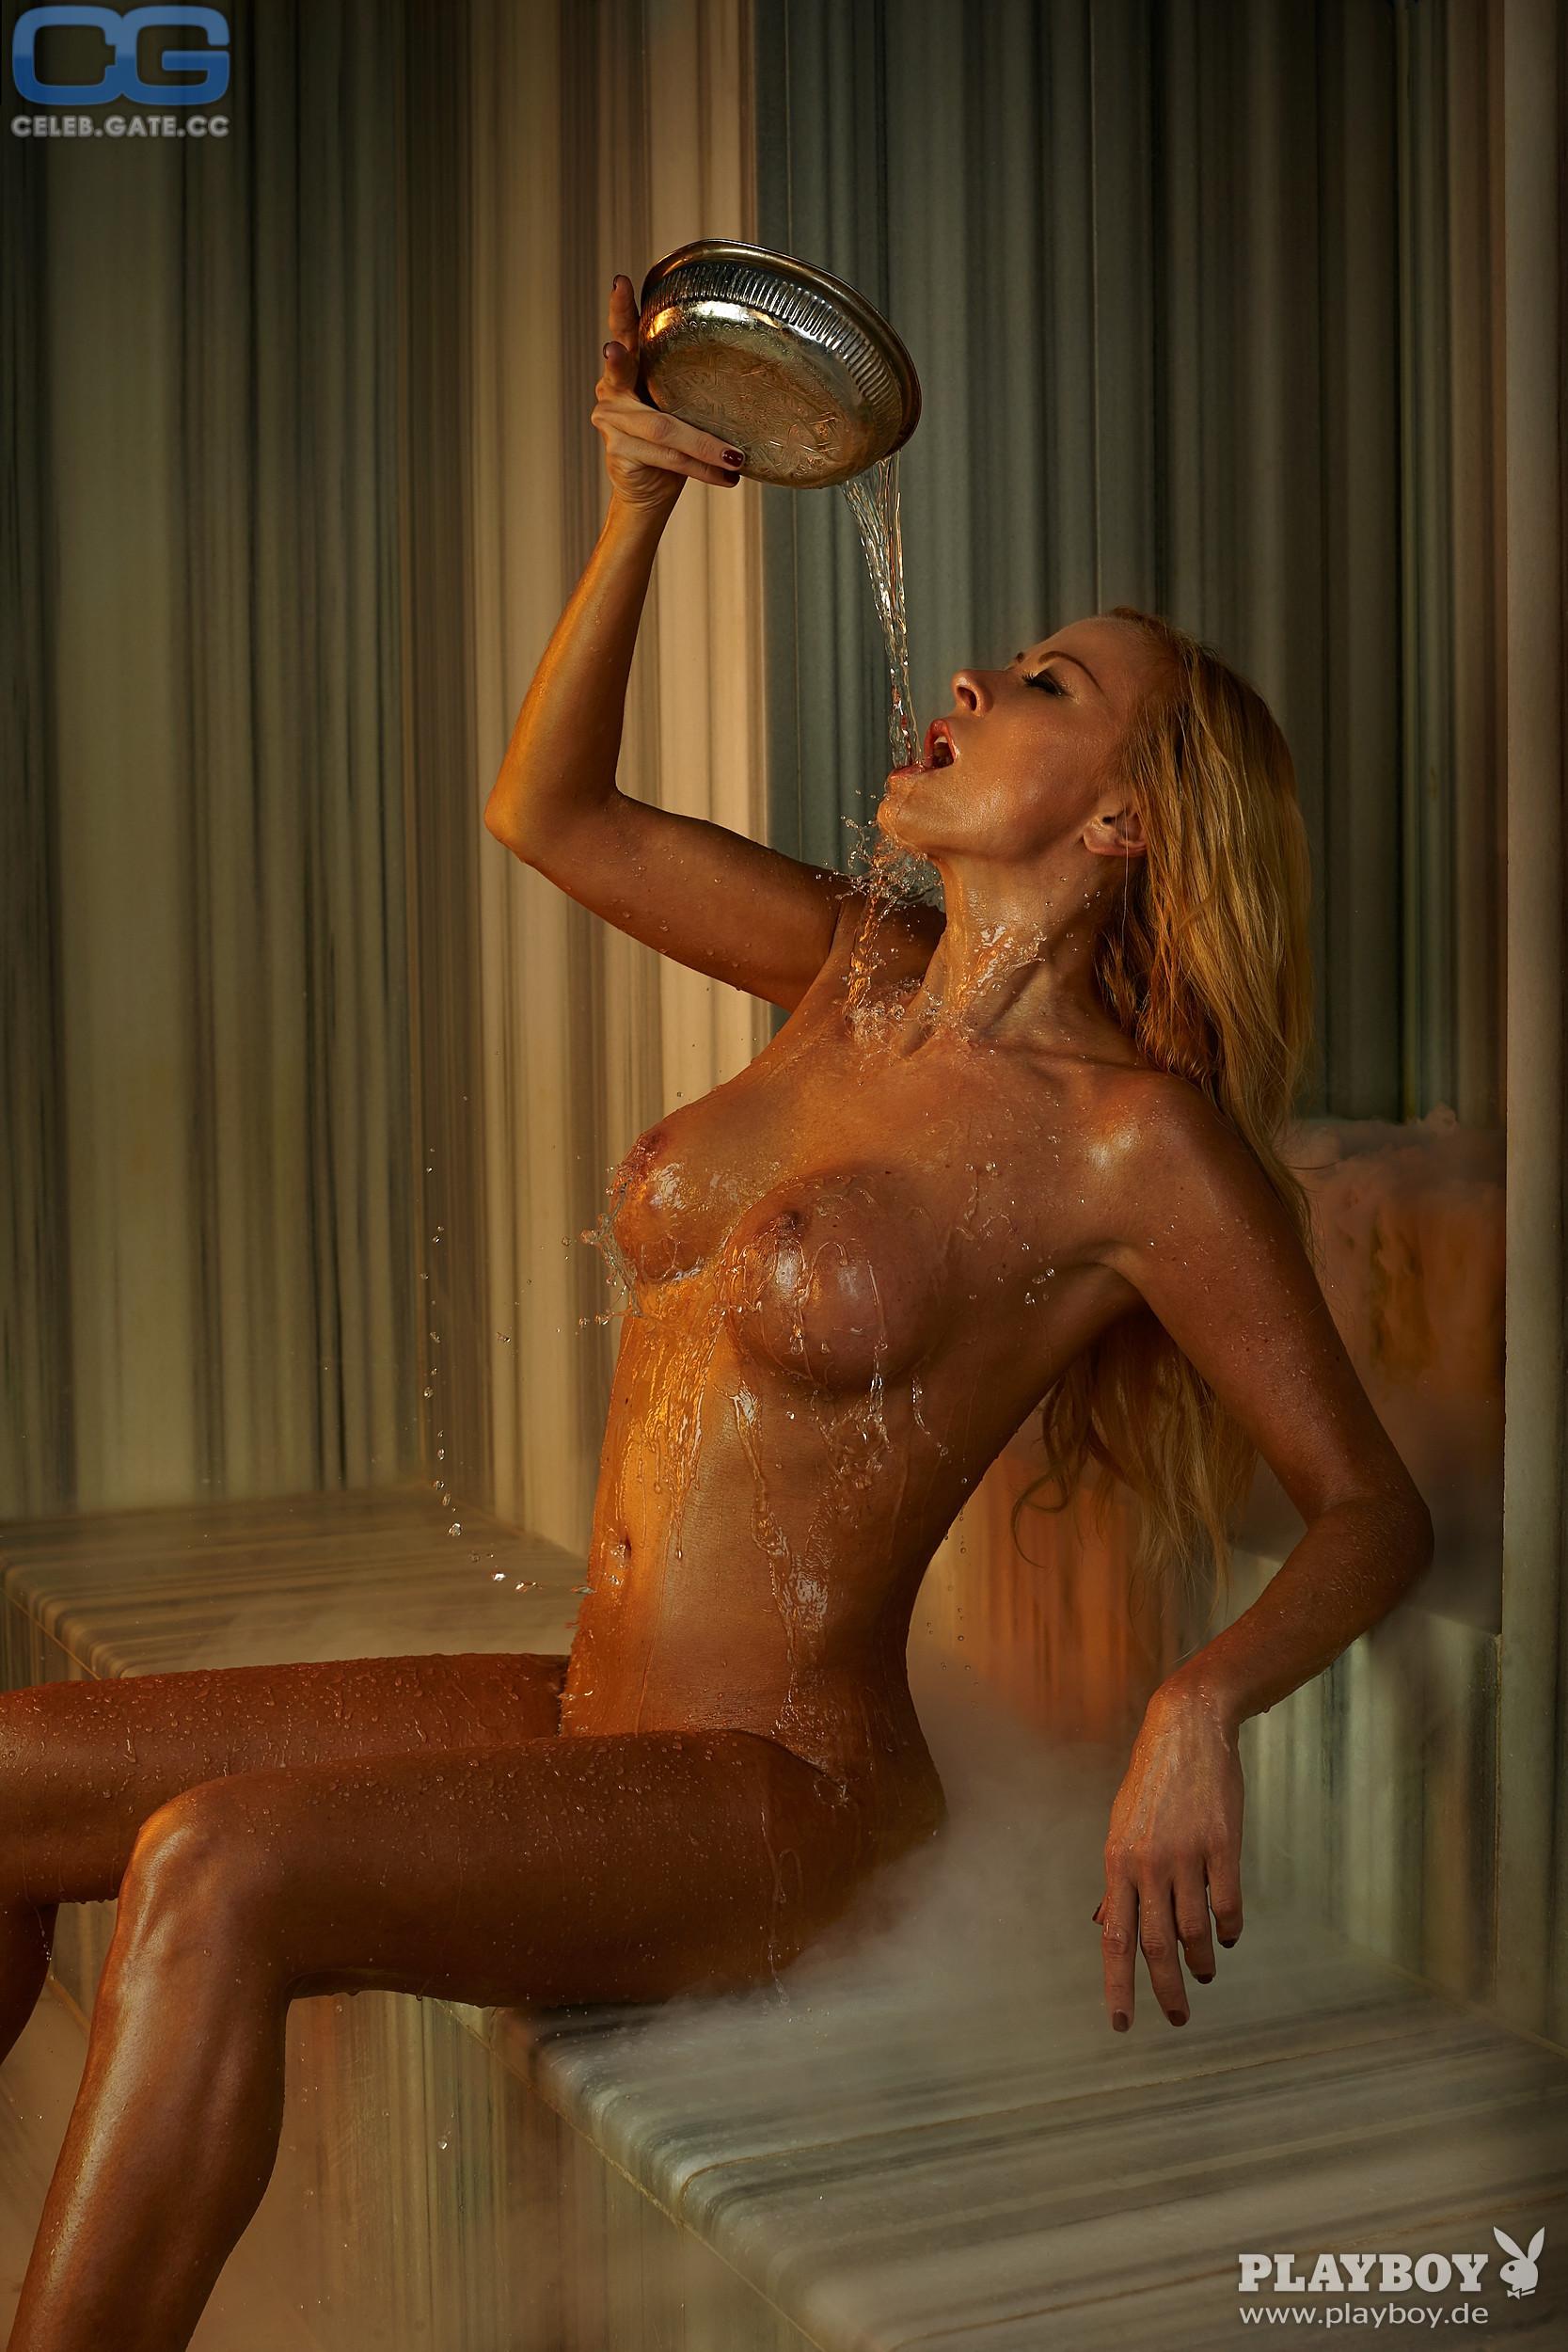 Jenny elvers jung nackt